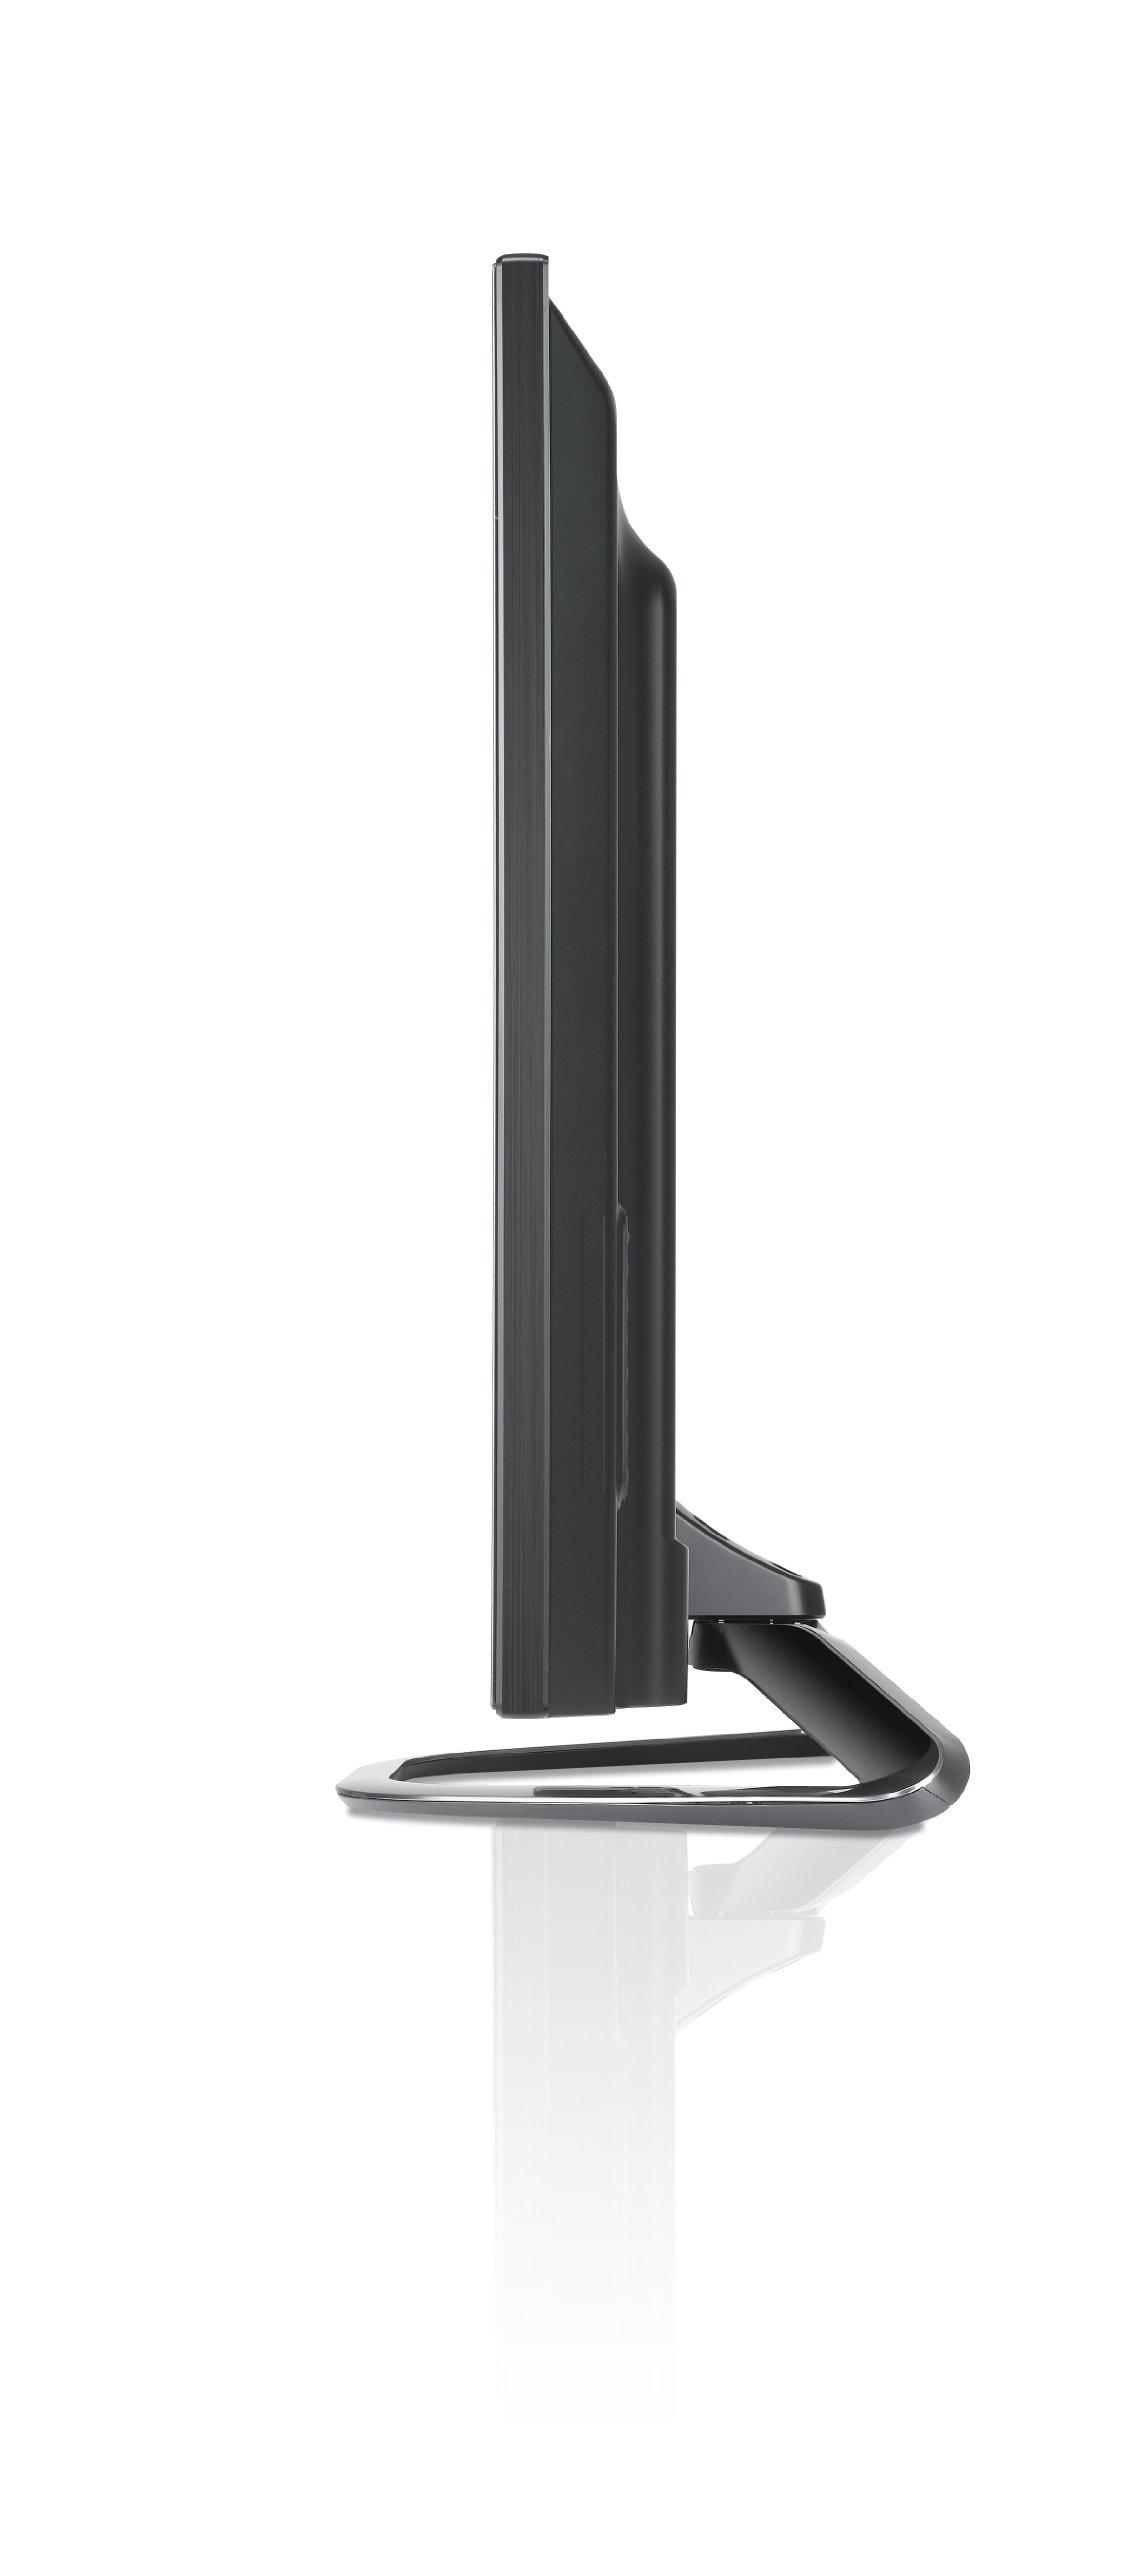 LG 32LA620V 32 Inch 3D LED Smart TV FHD Video Camera Ready WiFi: Amazon.es: Electrónica